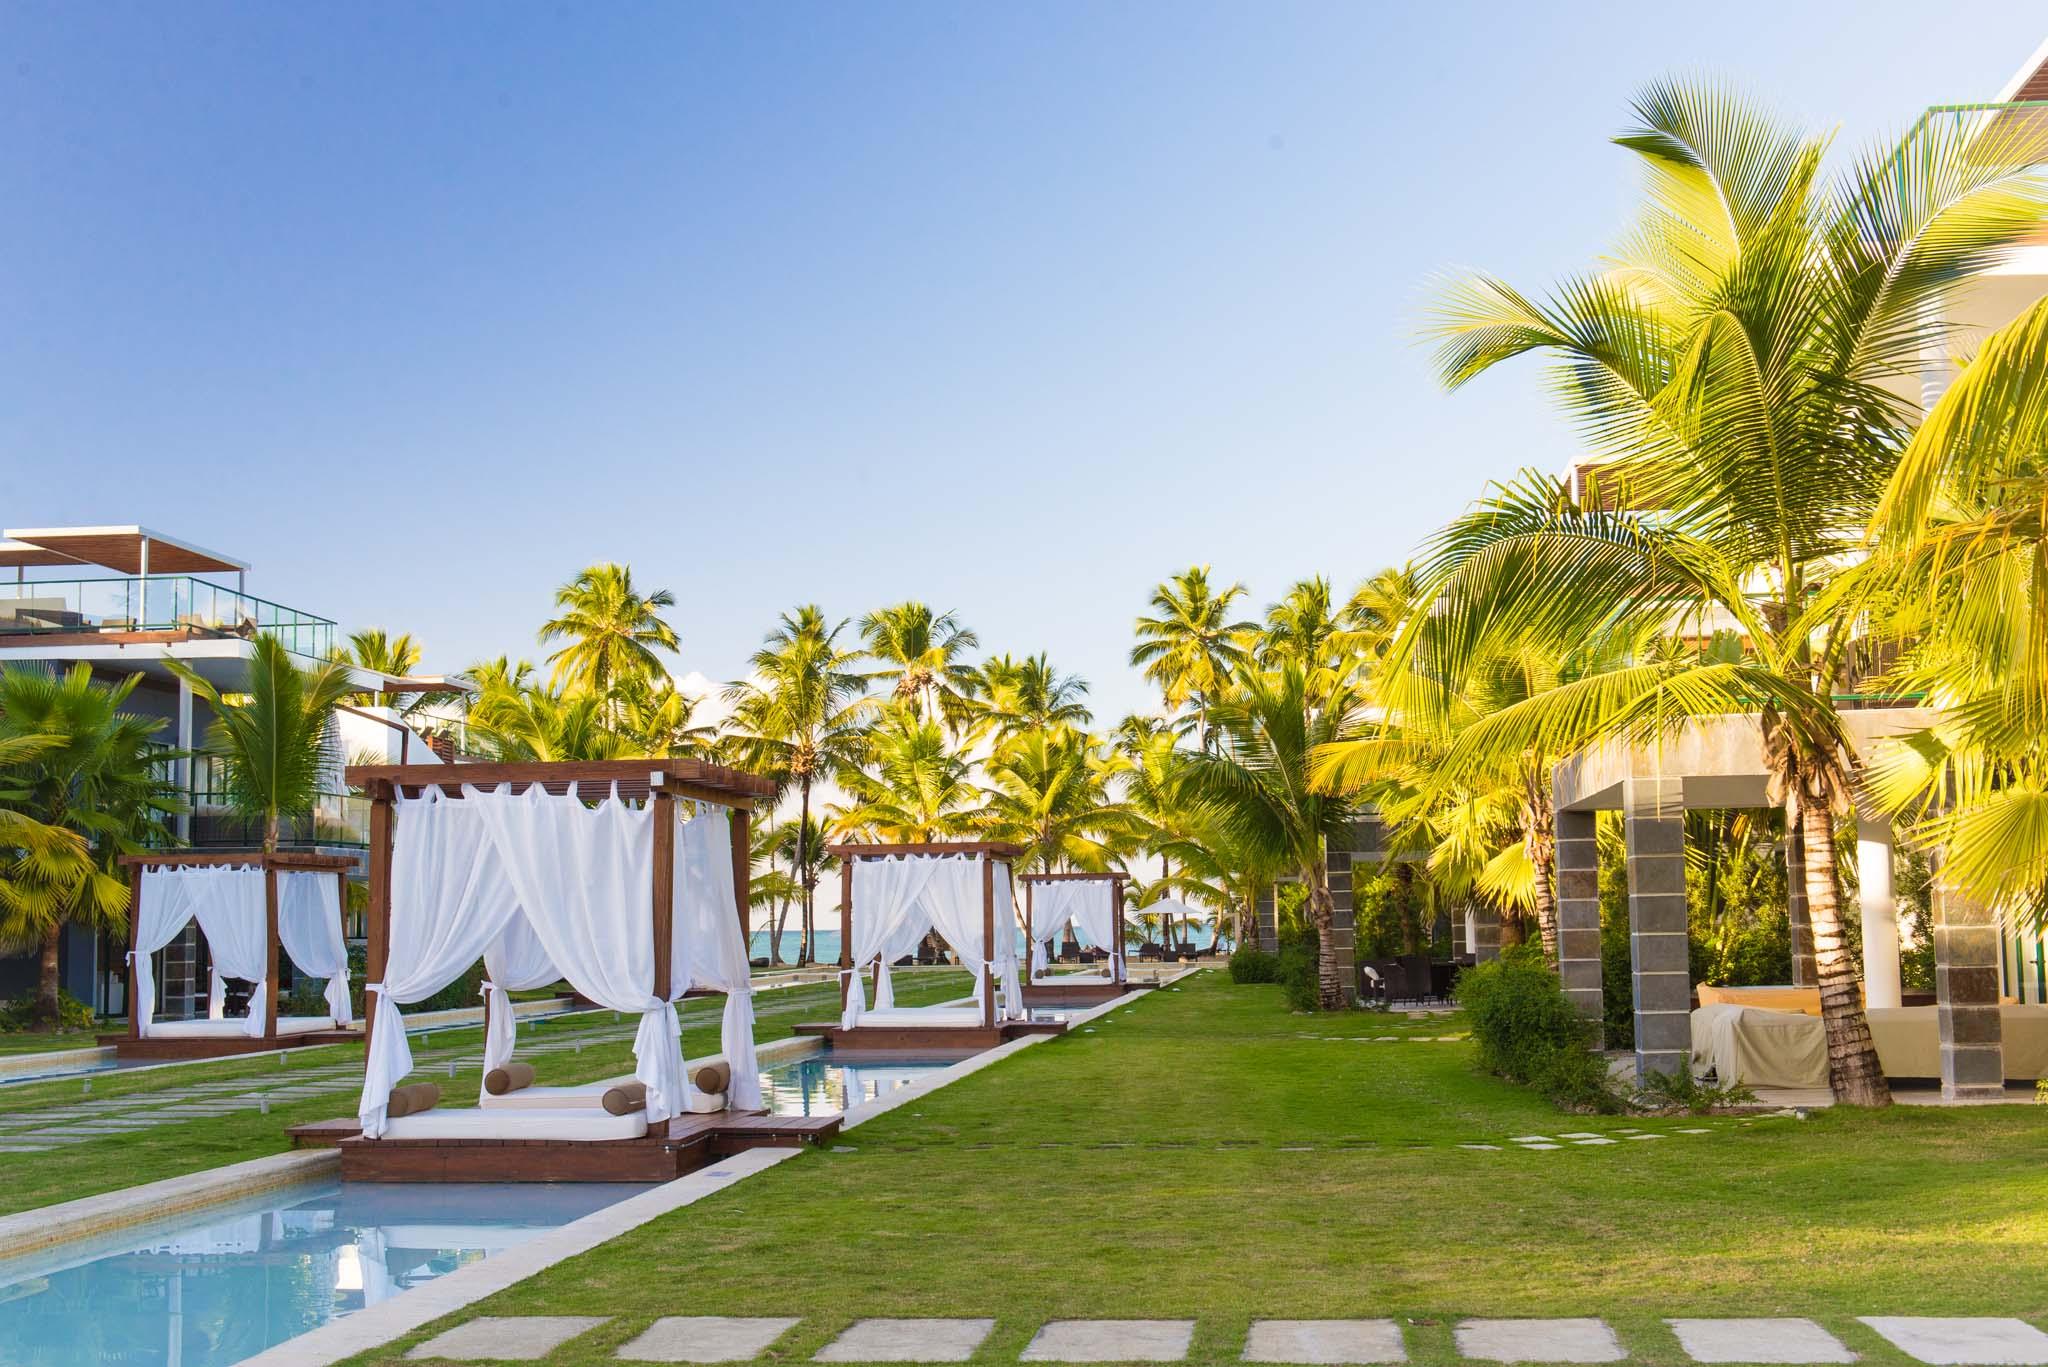 LUXURY BEACHFRONT HOTEL RESIDENCE - SEE THE OCEAN, ENJOY THE AMENITIES - A539LT